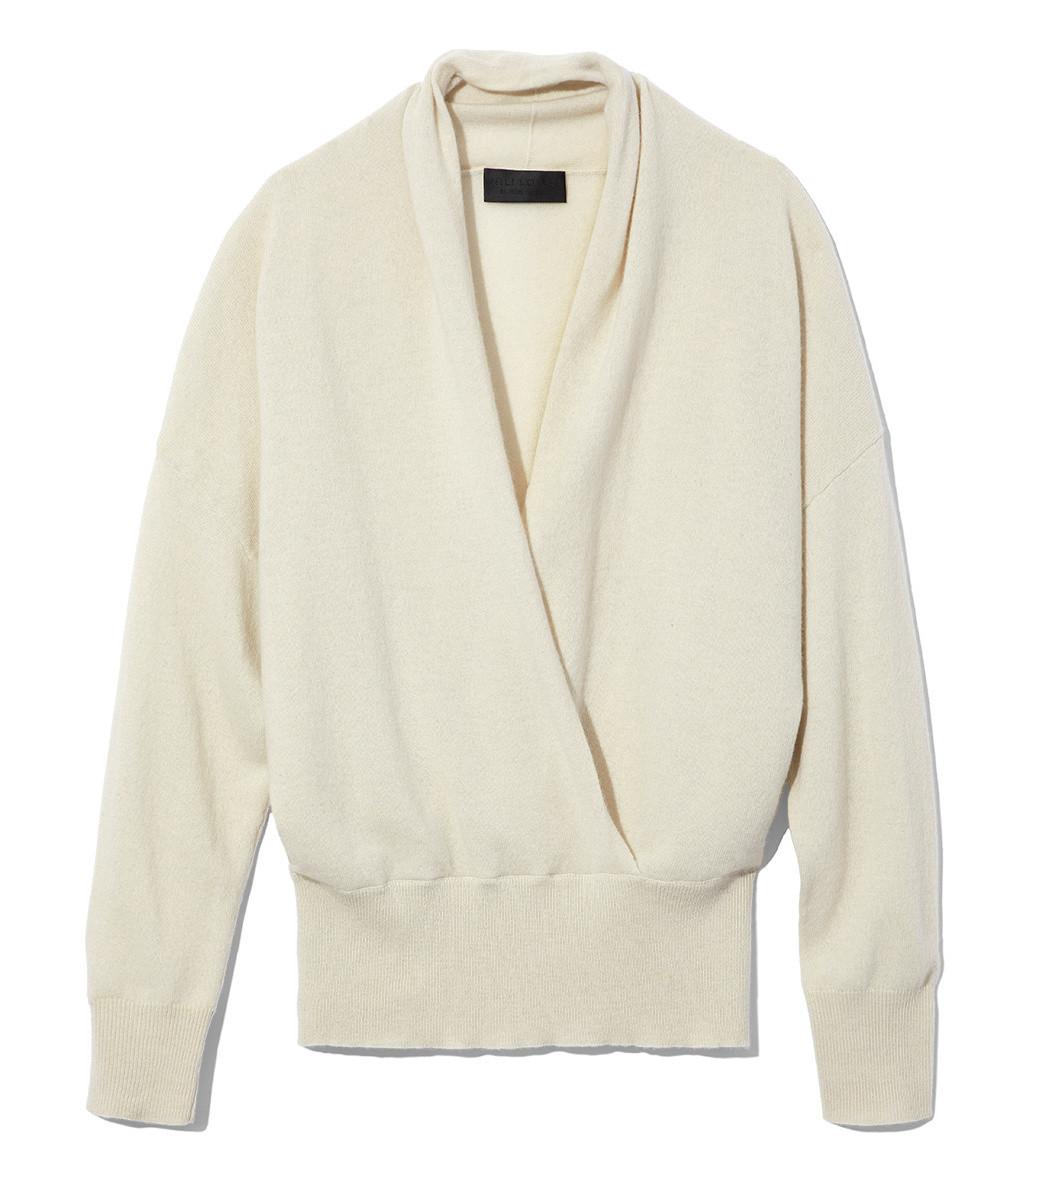 3a17124370 Shop Nili Lotan Lakota Sweater In Ivory